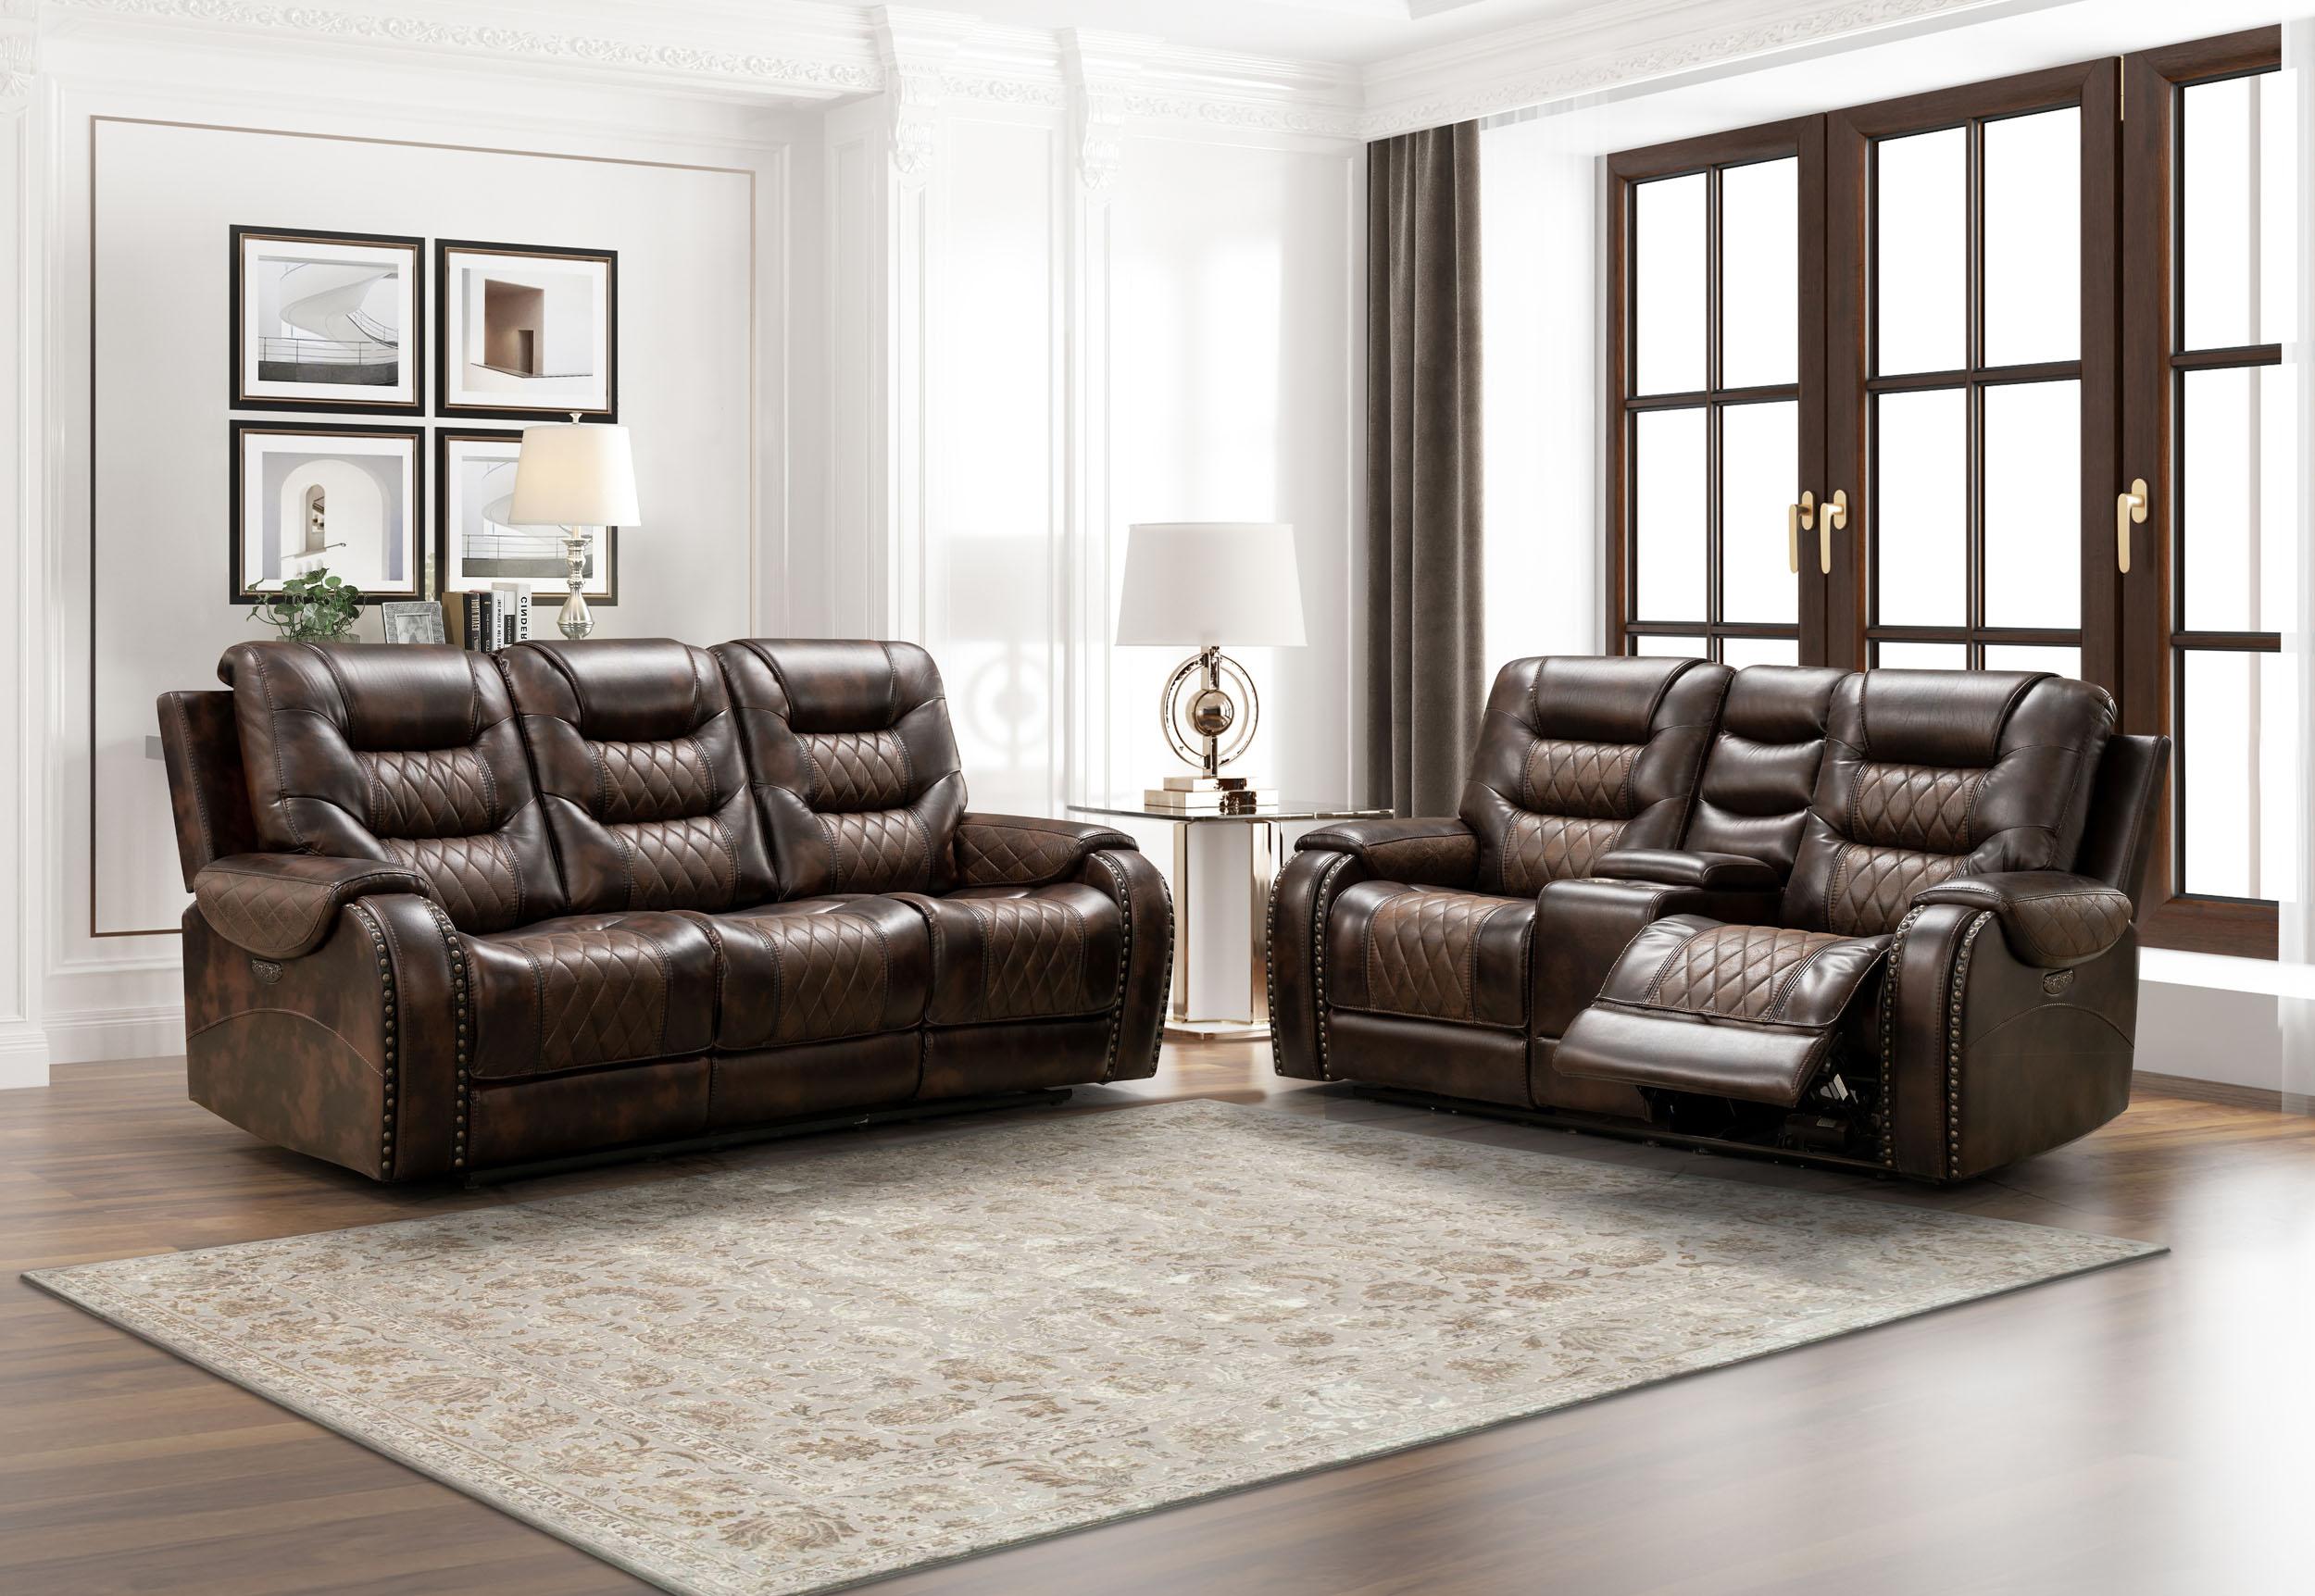 LRPX2895 Badlands Two Tone Reclining Living Room Set